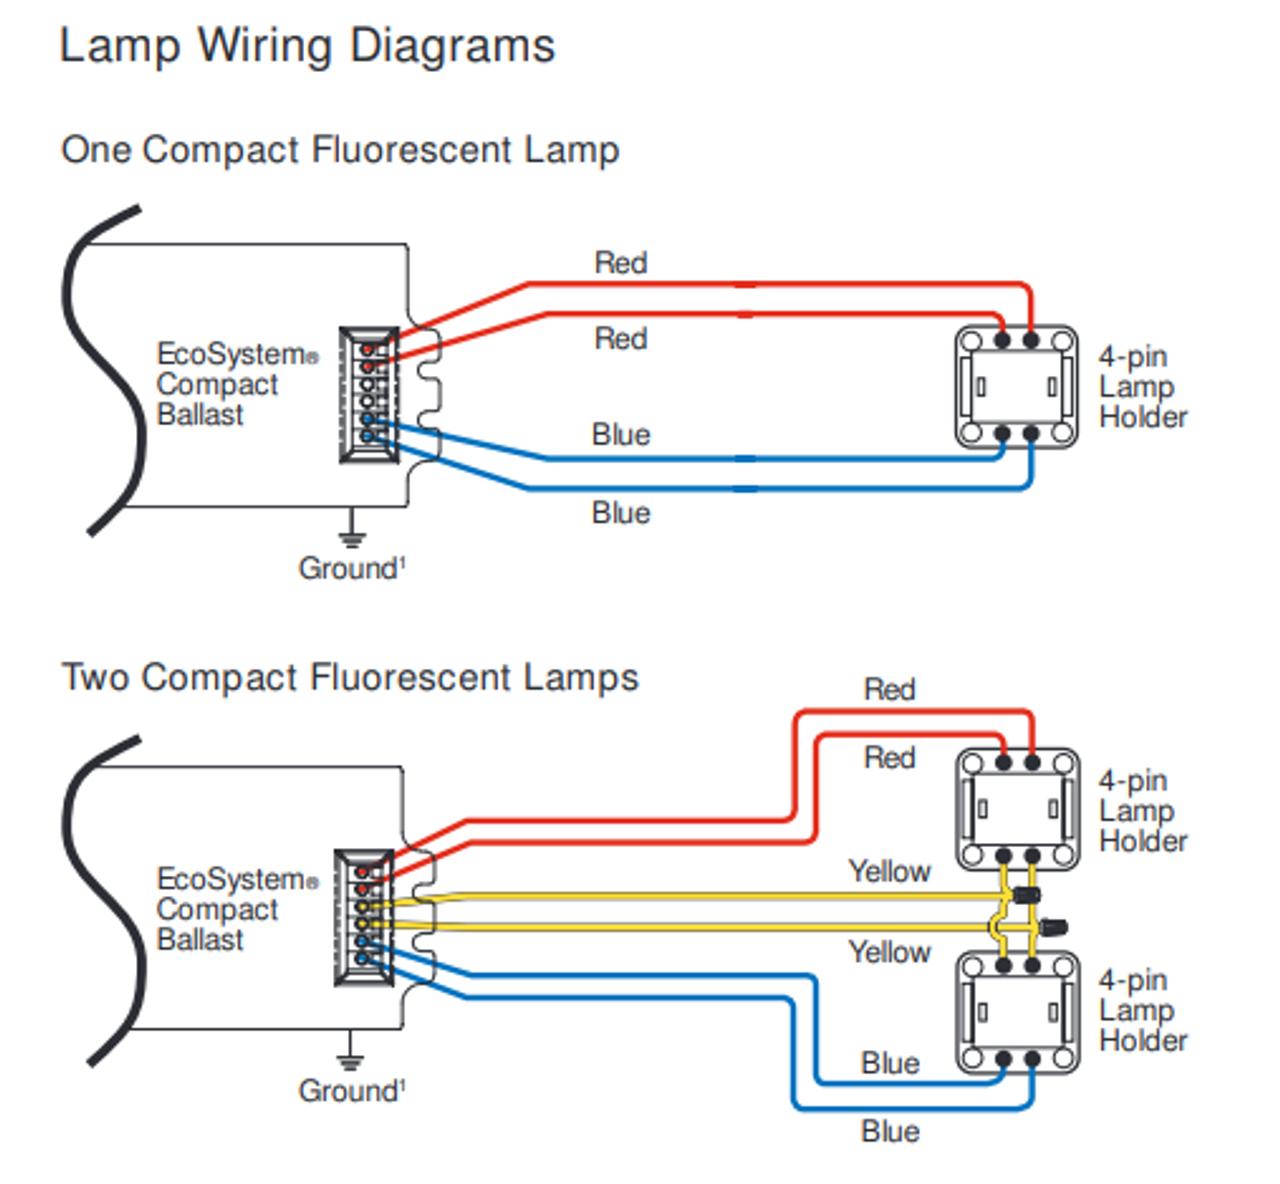 Diagram Advance Mark 7 0 10v Wiring Diagram Full Version Hd Quality Wiring Diagram Diagramoftheuniverse B2bnetwork It